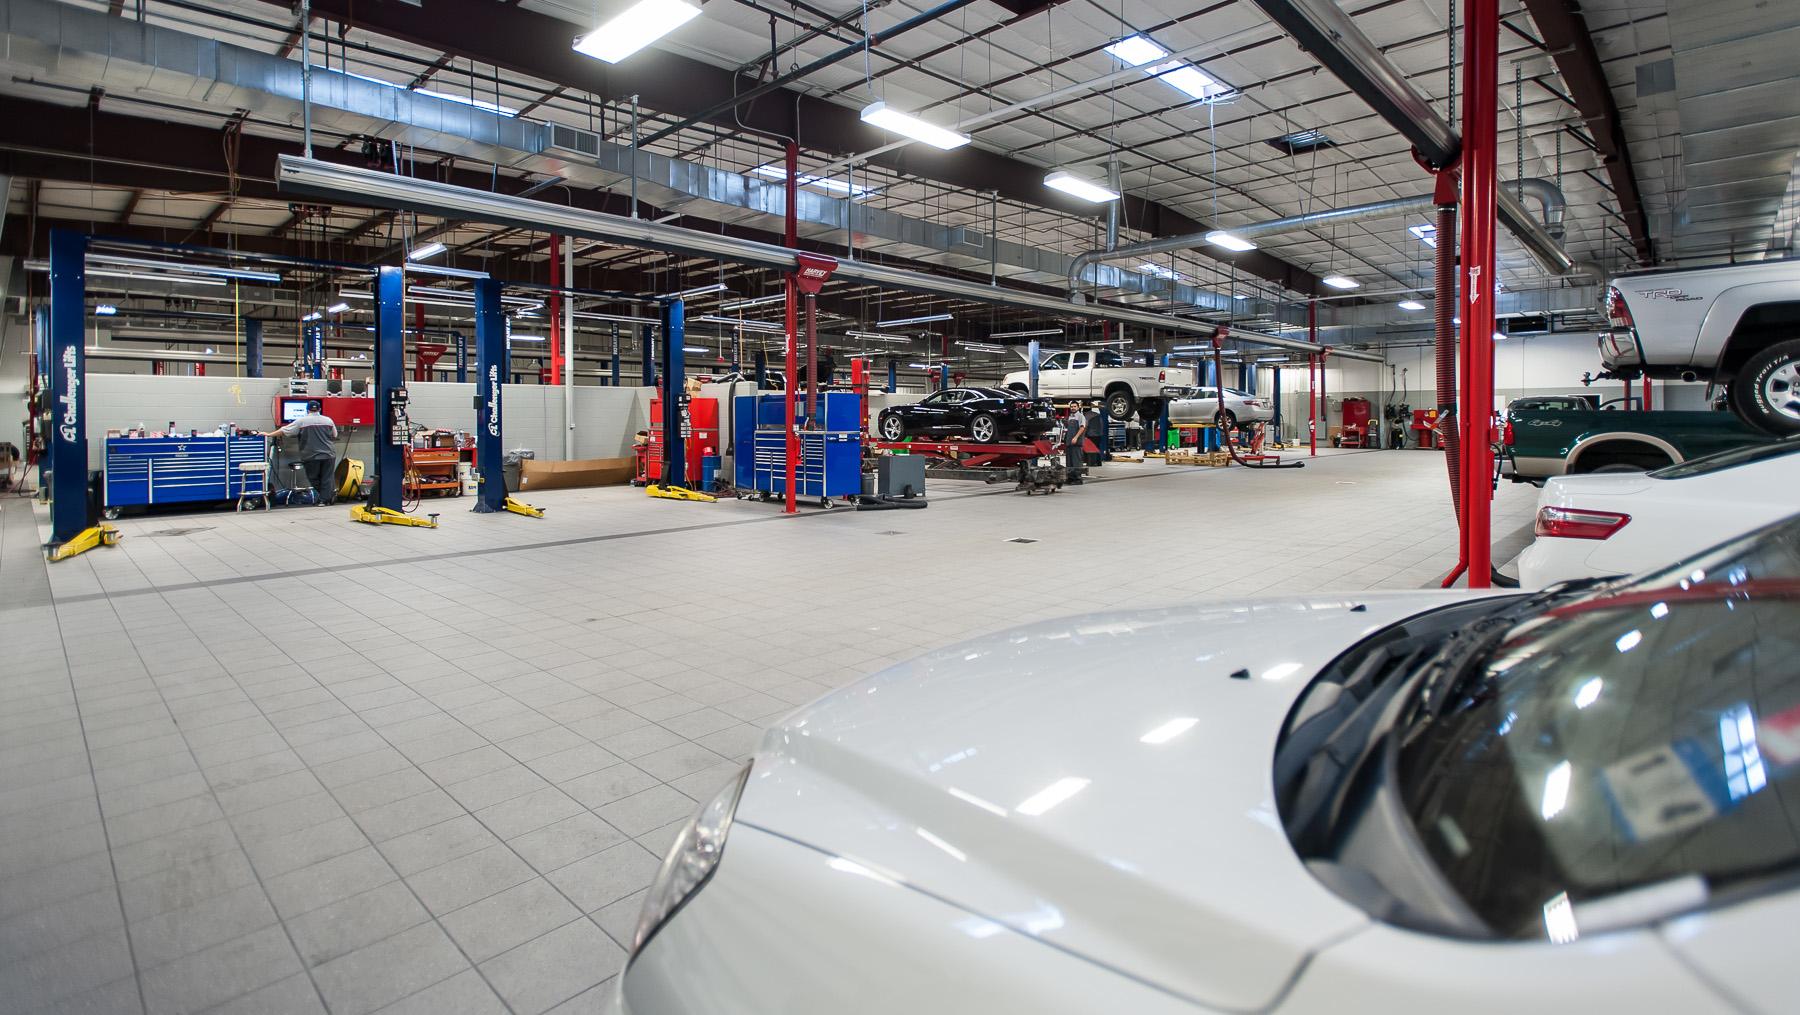 Buick Dealership Corpus Christi >> AutoNation Toyota Corpus Christi, Corpus Christi Texas (TX) - LocalDatabase.com